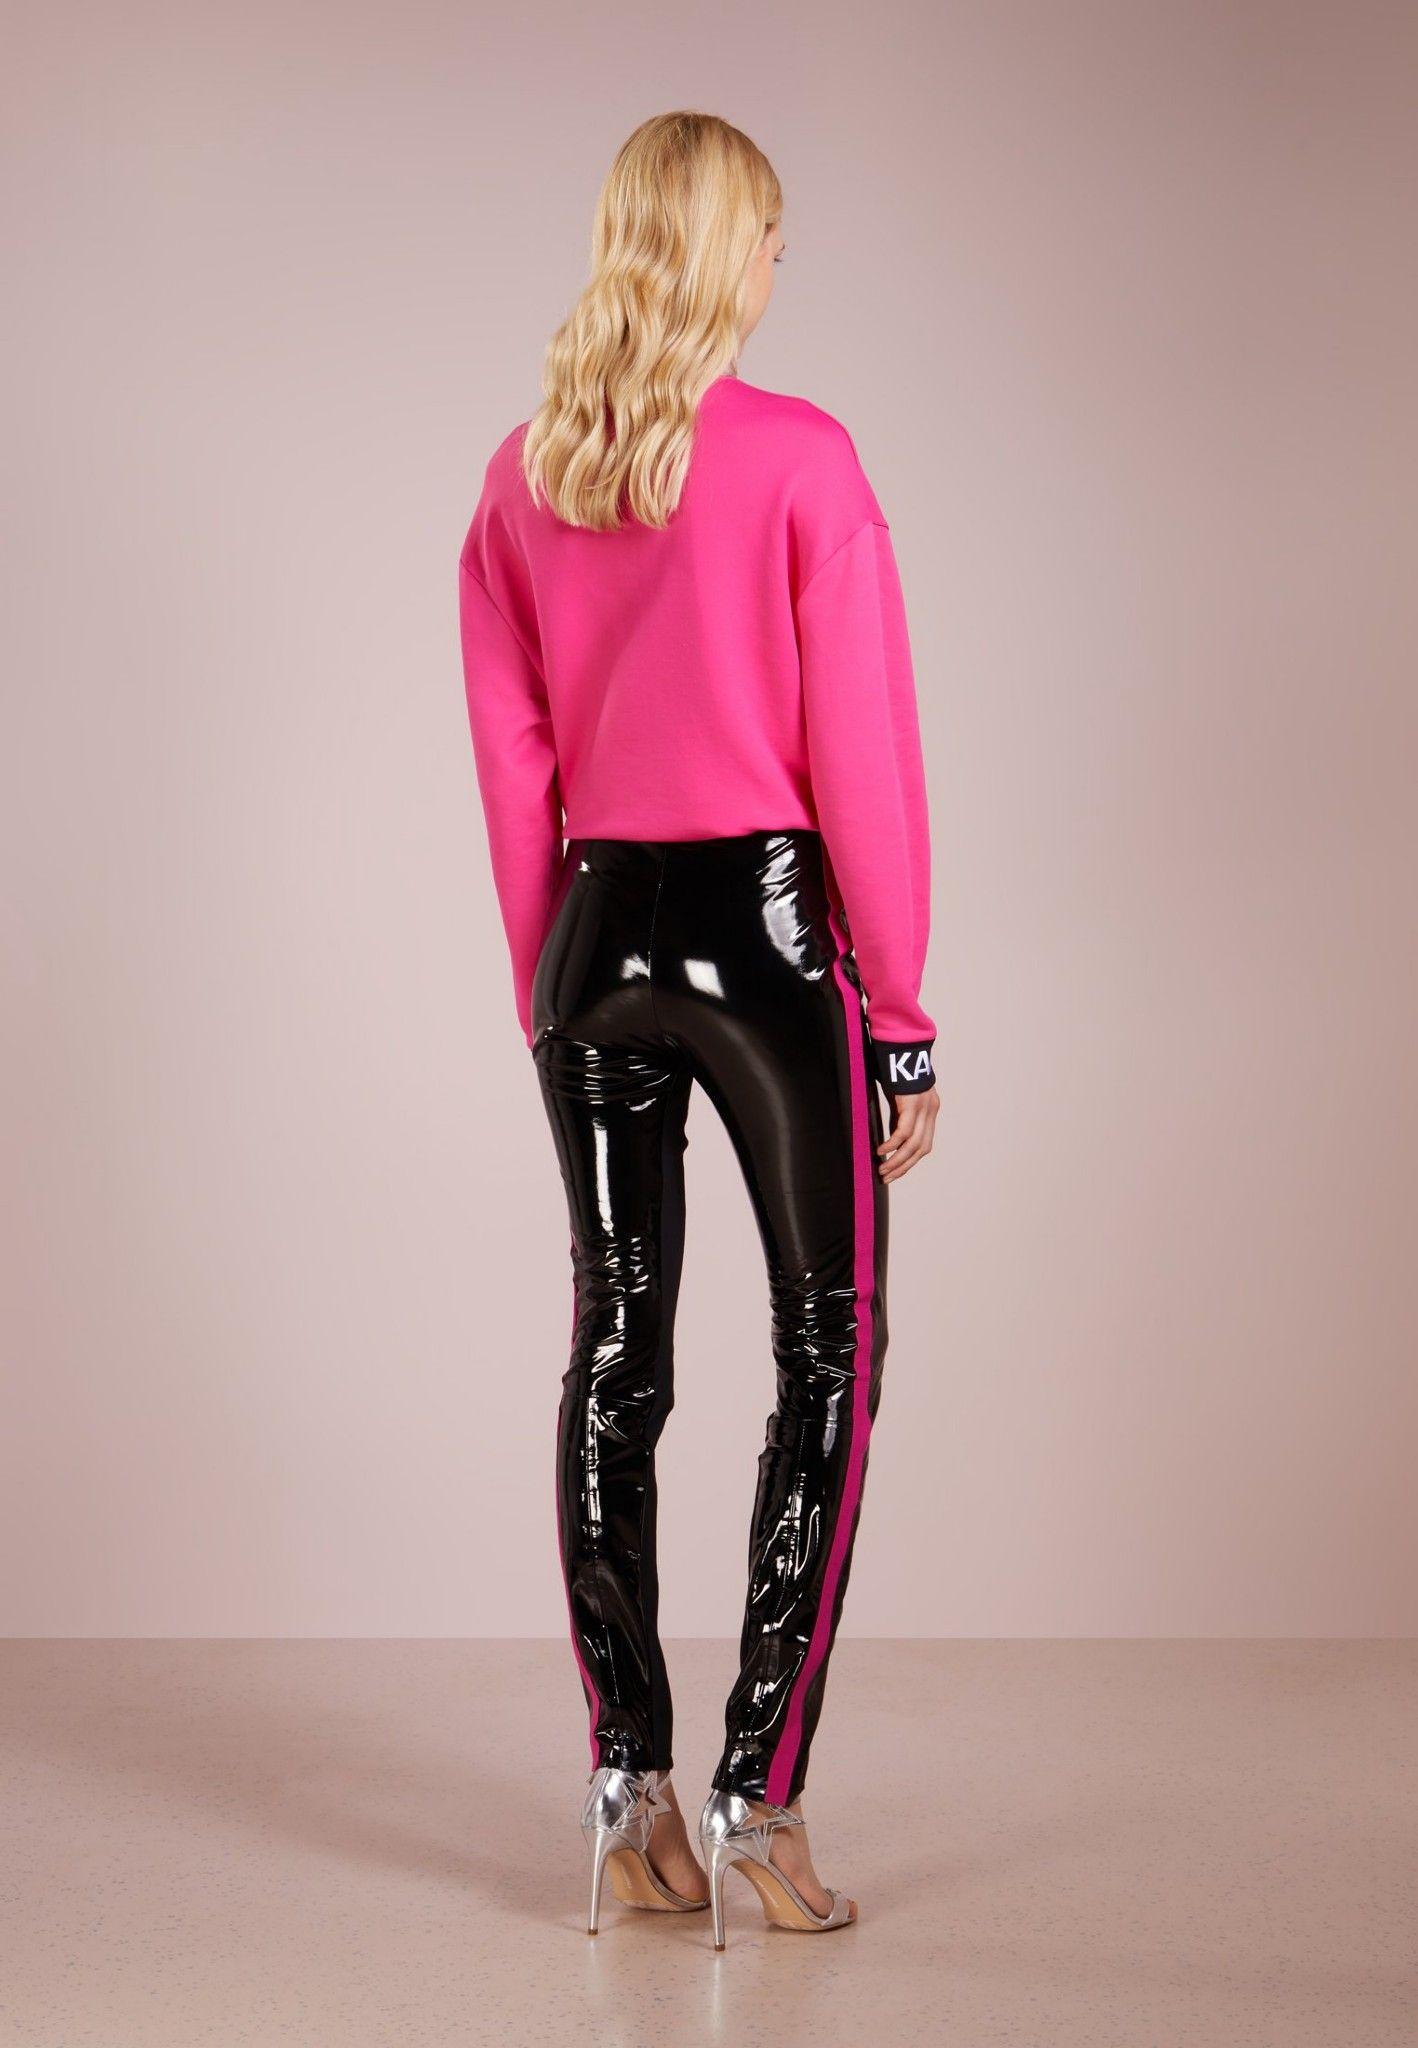 bcb58ce3c3dc4 Karl Lagerfeld pants. Top 1 purchase now! #Stripe leather pants ...